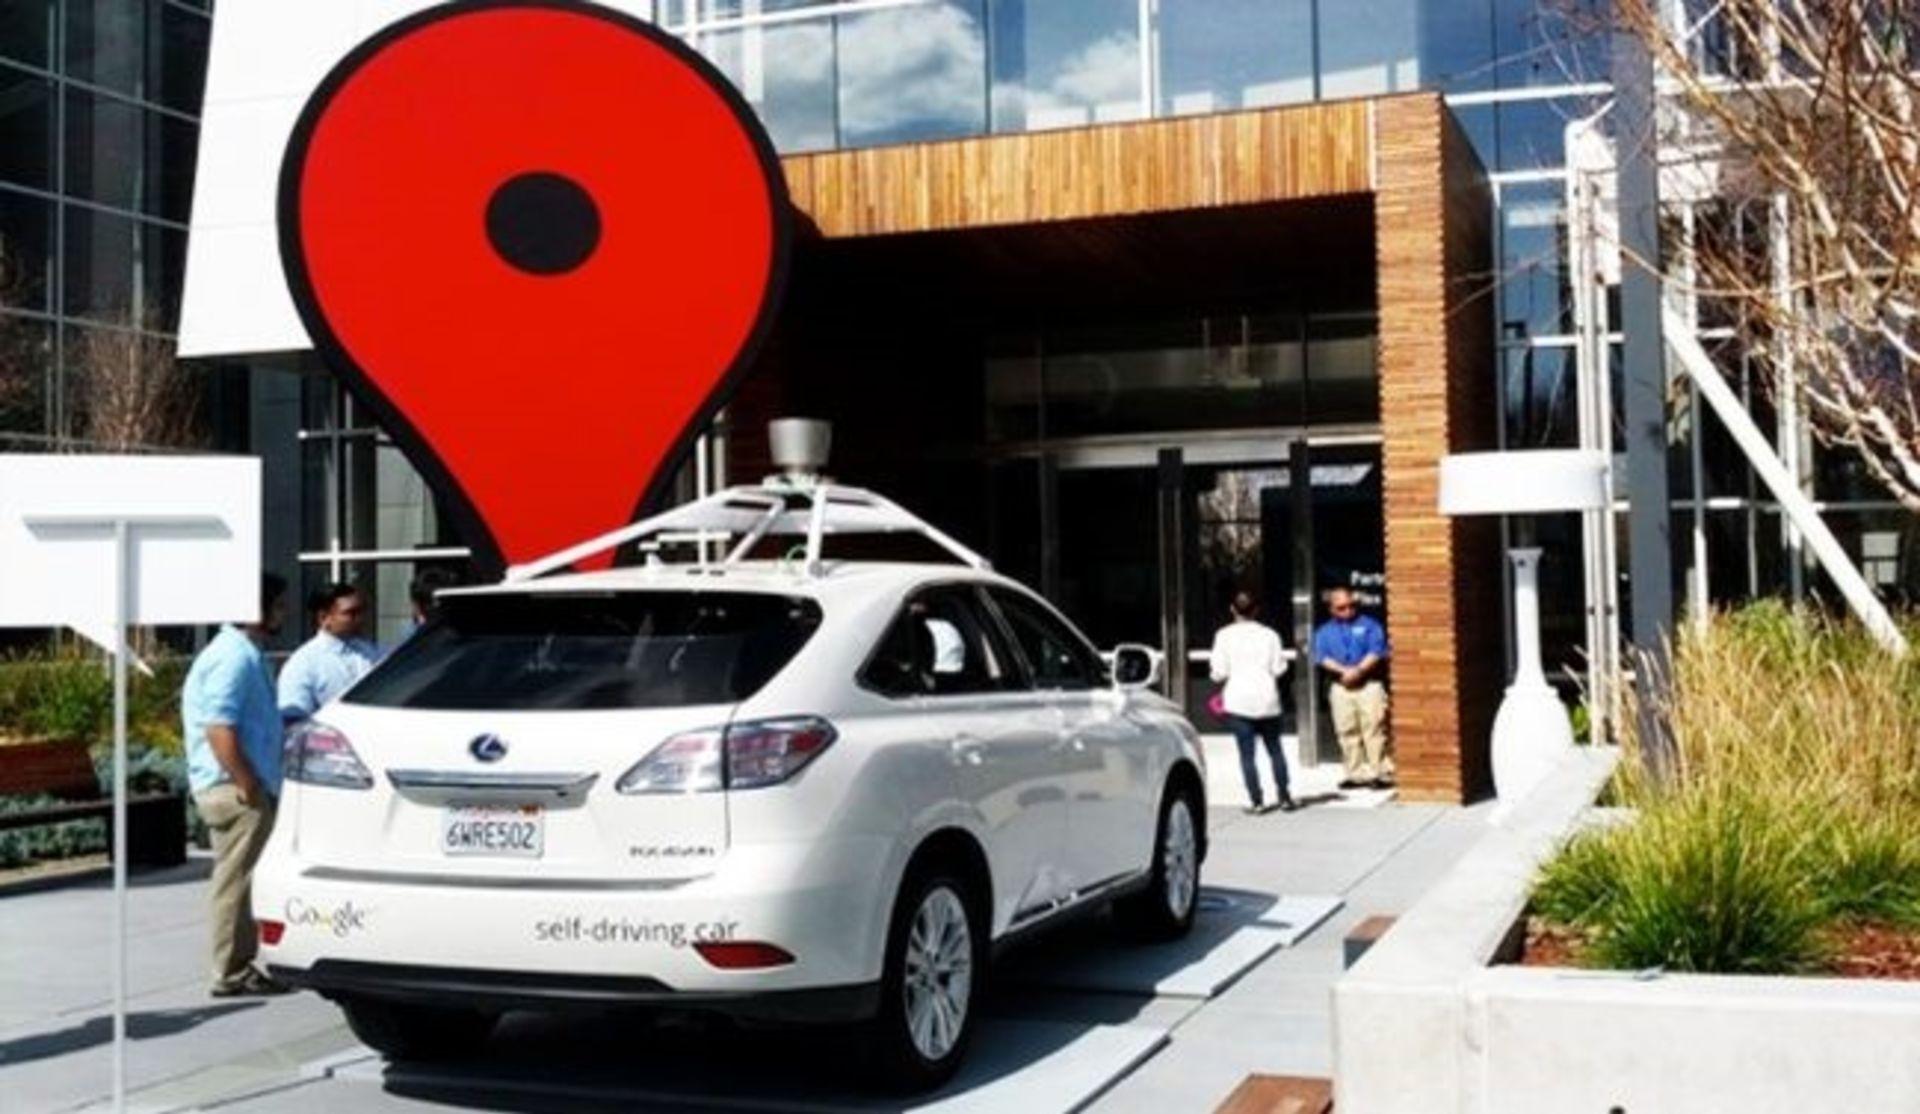 Will self-driving cars accelerate development?